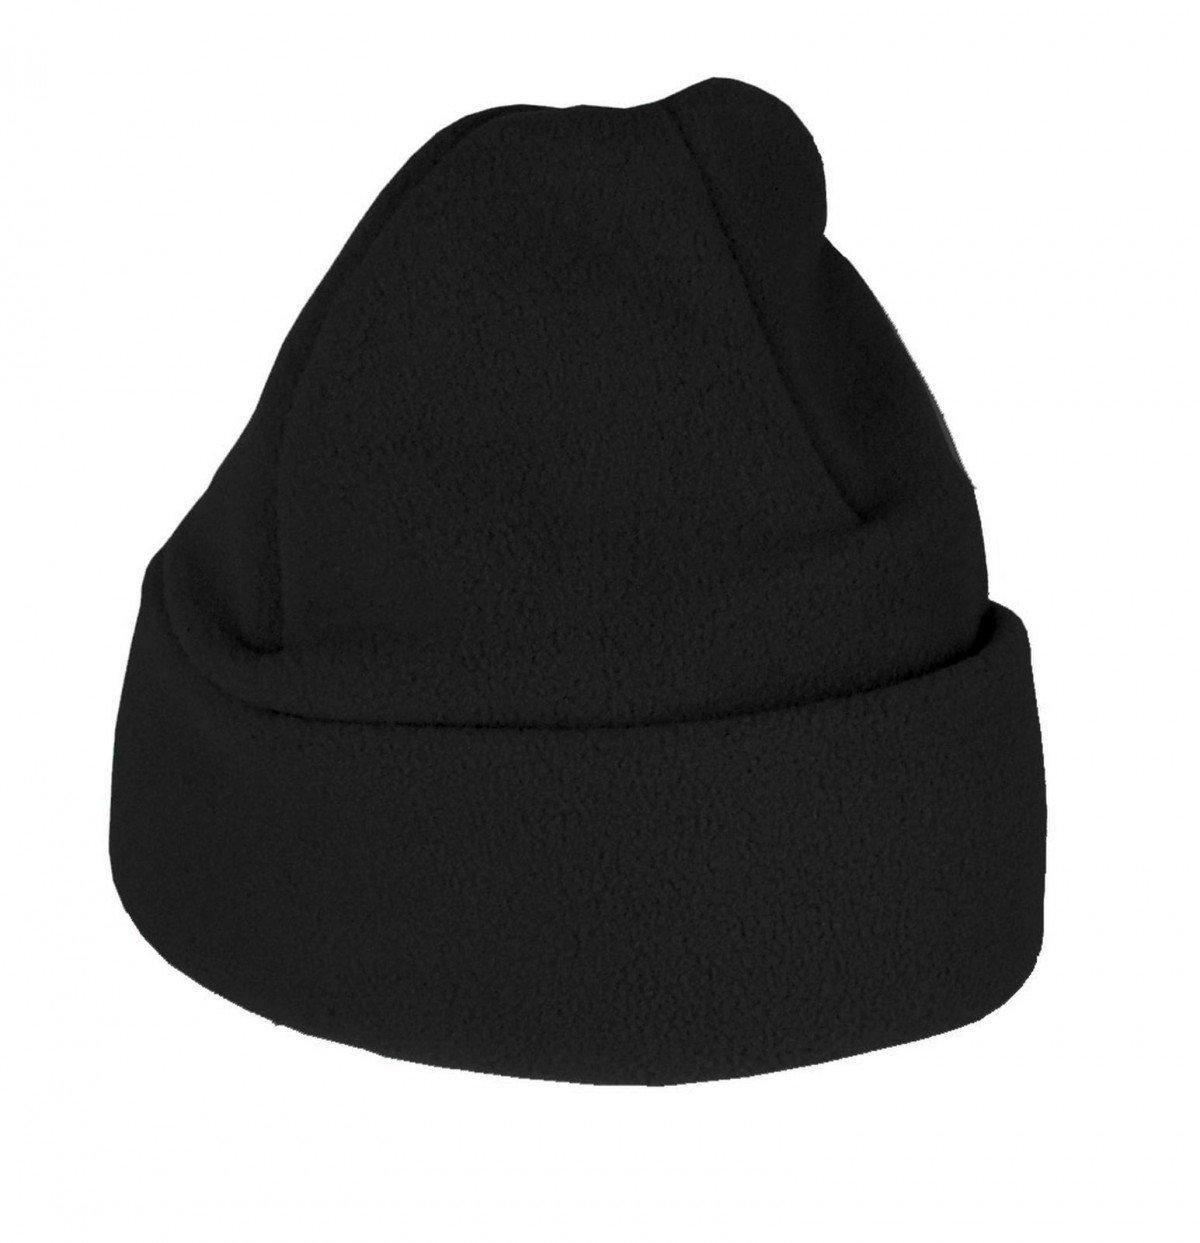 Childs Fleece Hat, Black Small